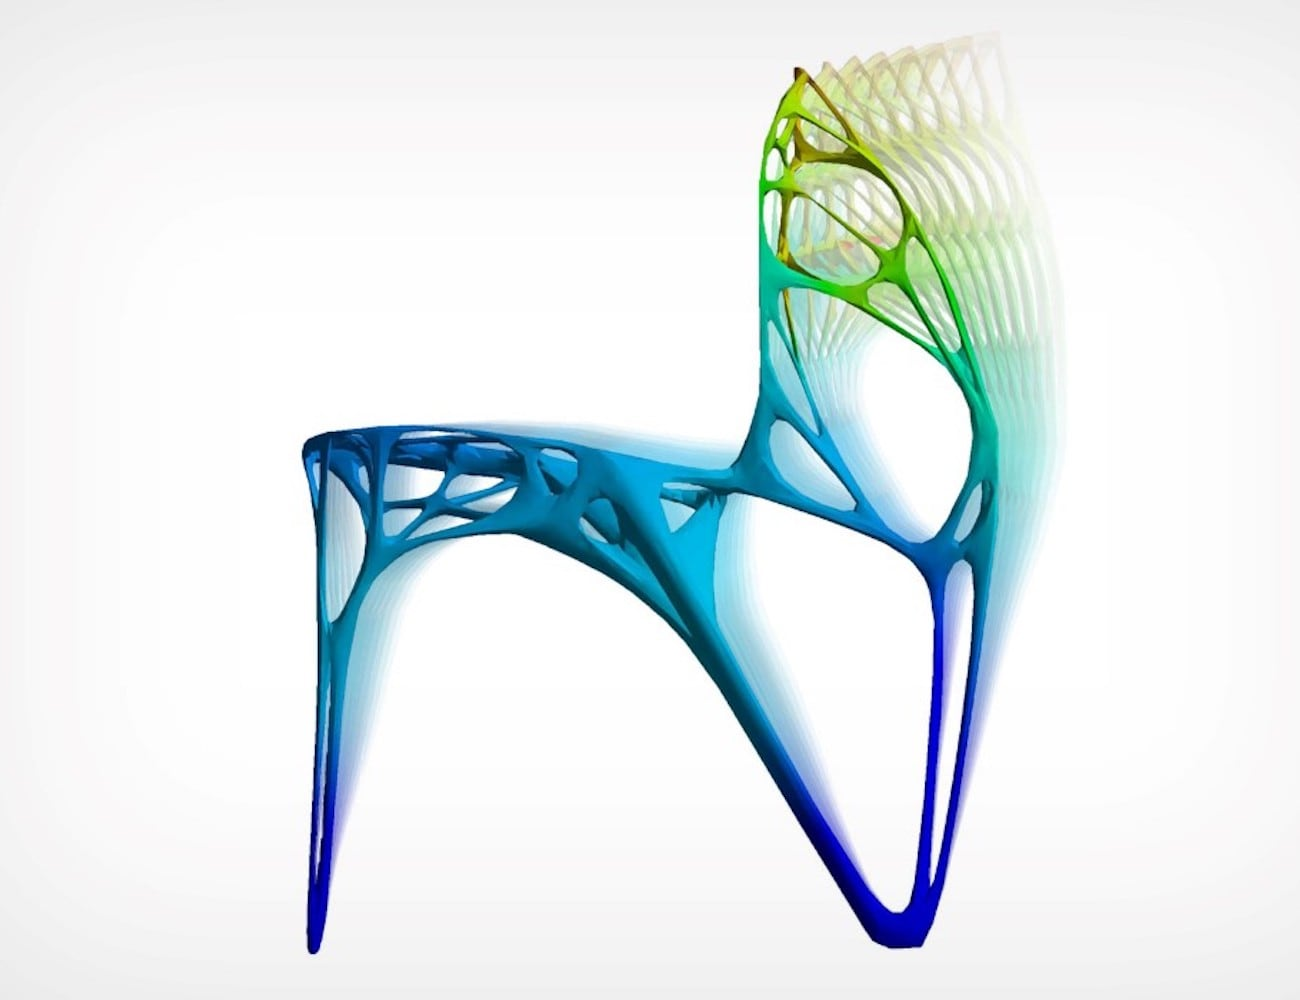 Yanko Design Parametric Design Generico Chair » Gadget Flow